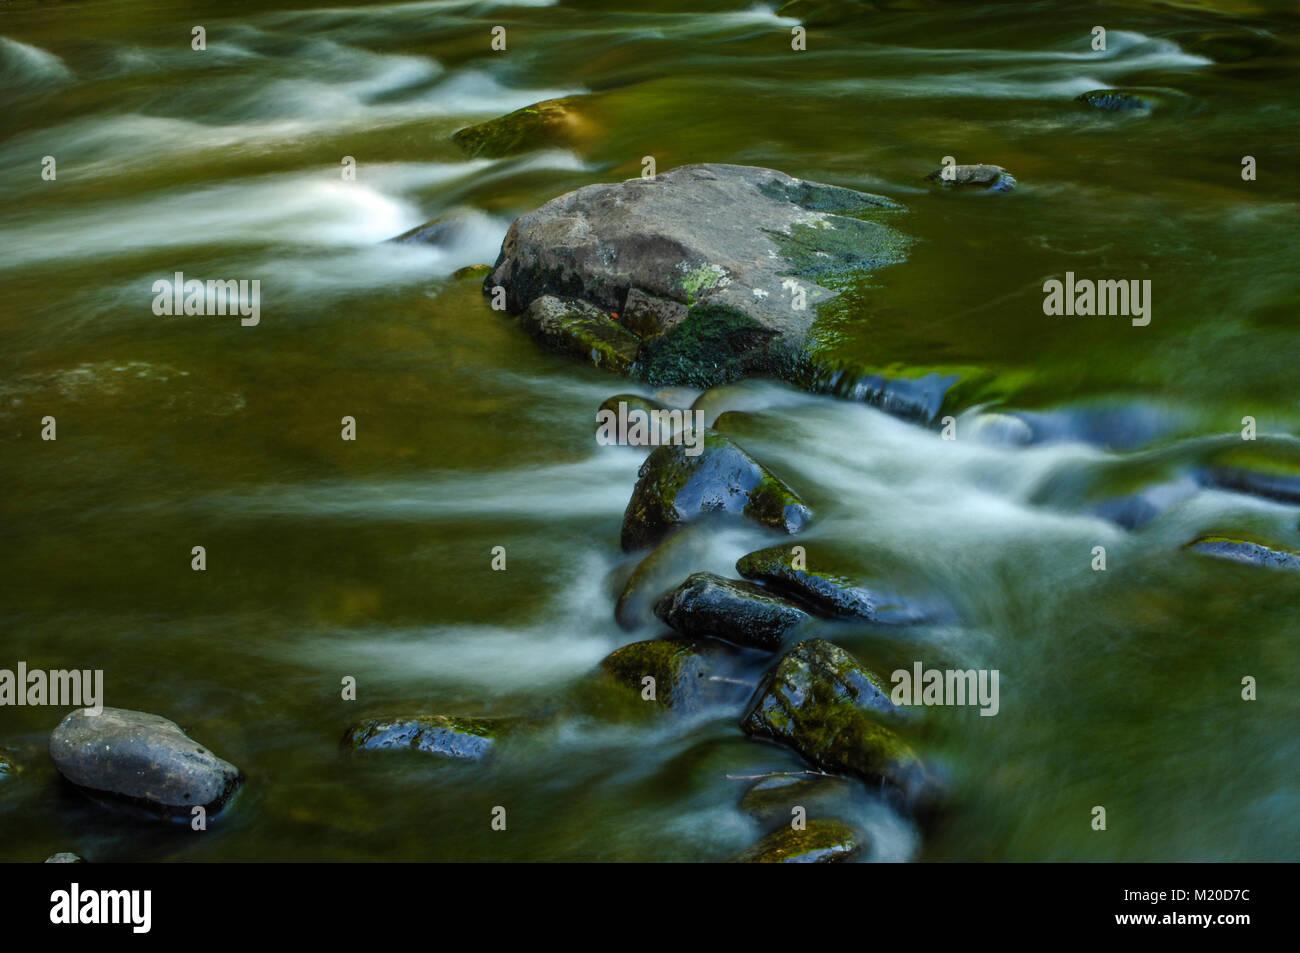 West Branch, Sacandaga River, Silver Lake Wilderness Area, Adirondack Forest Preserve, New York - Stock Image